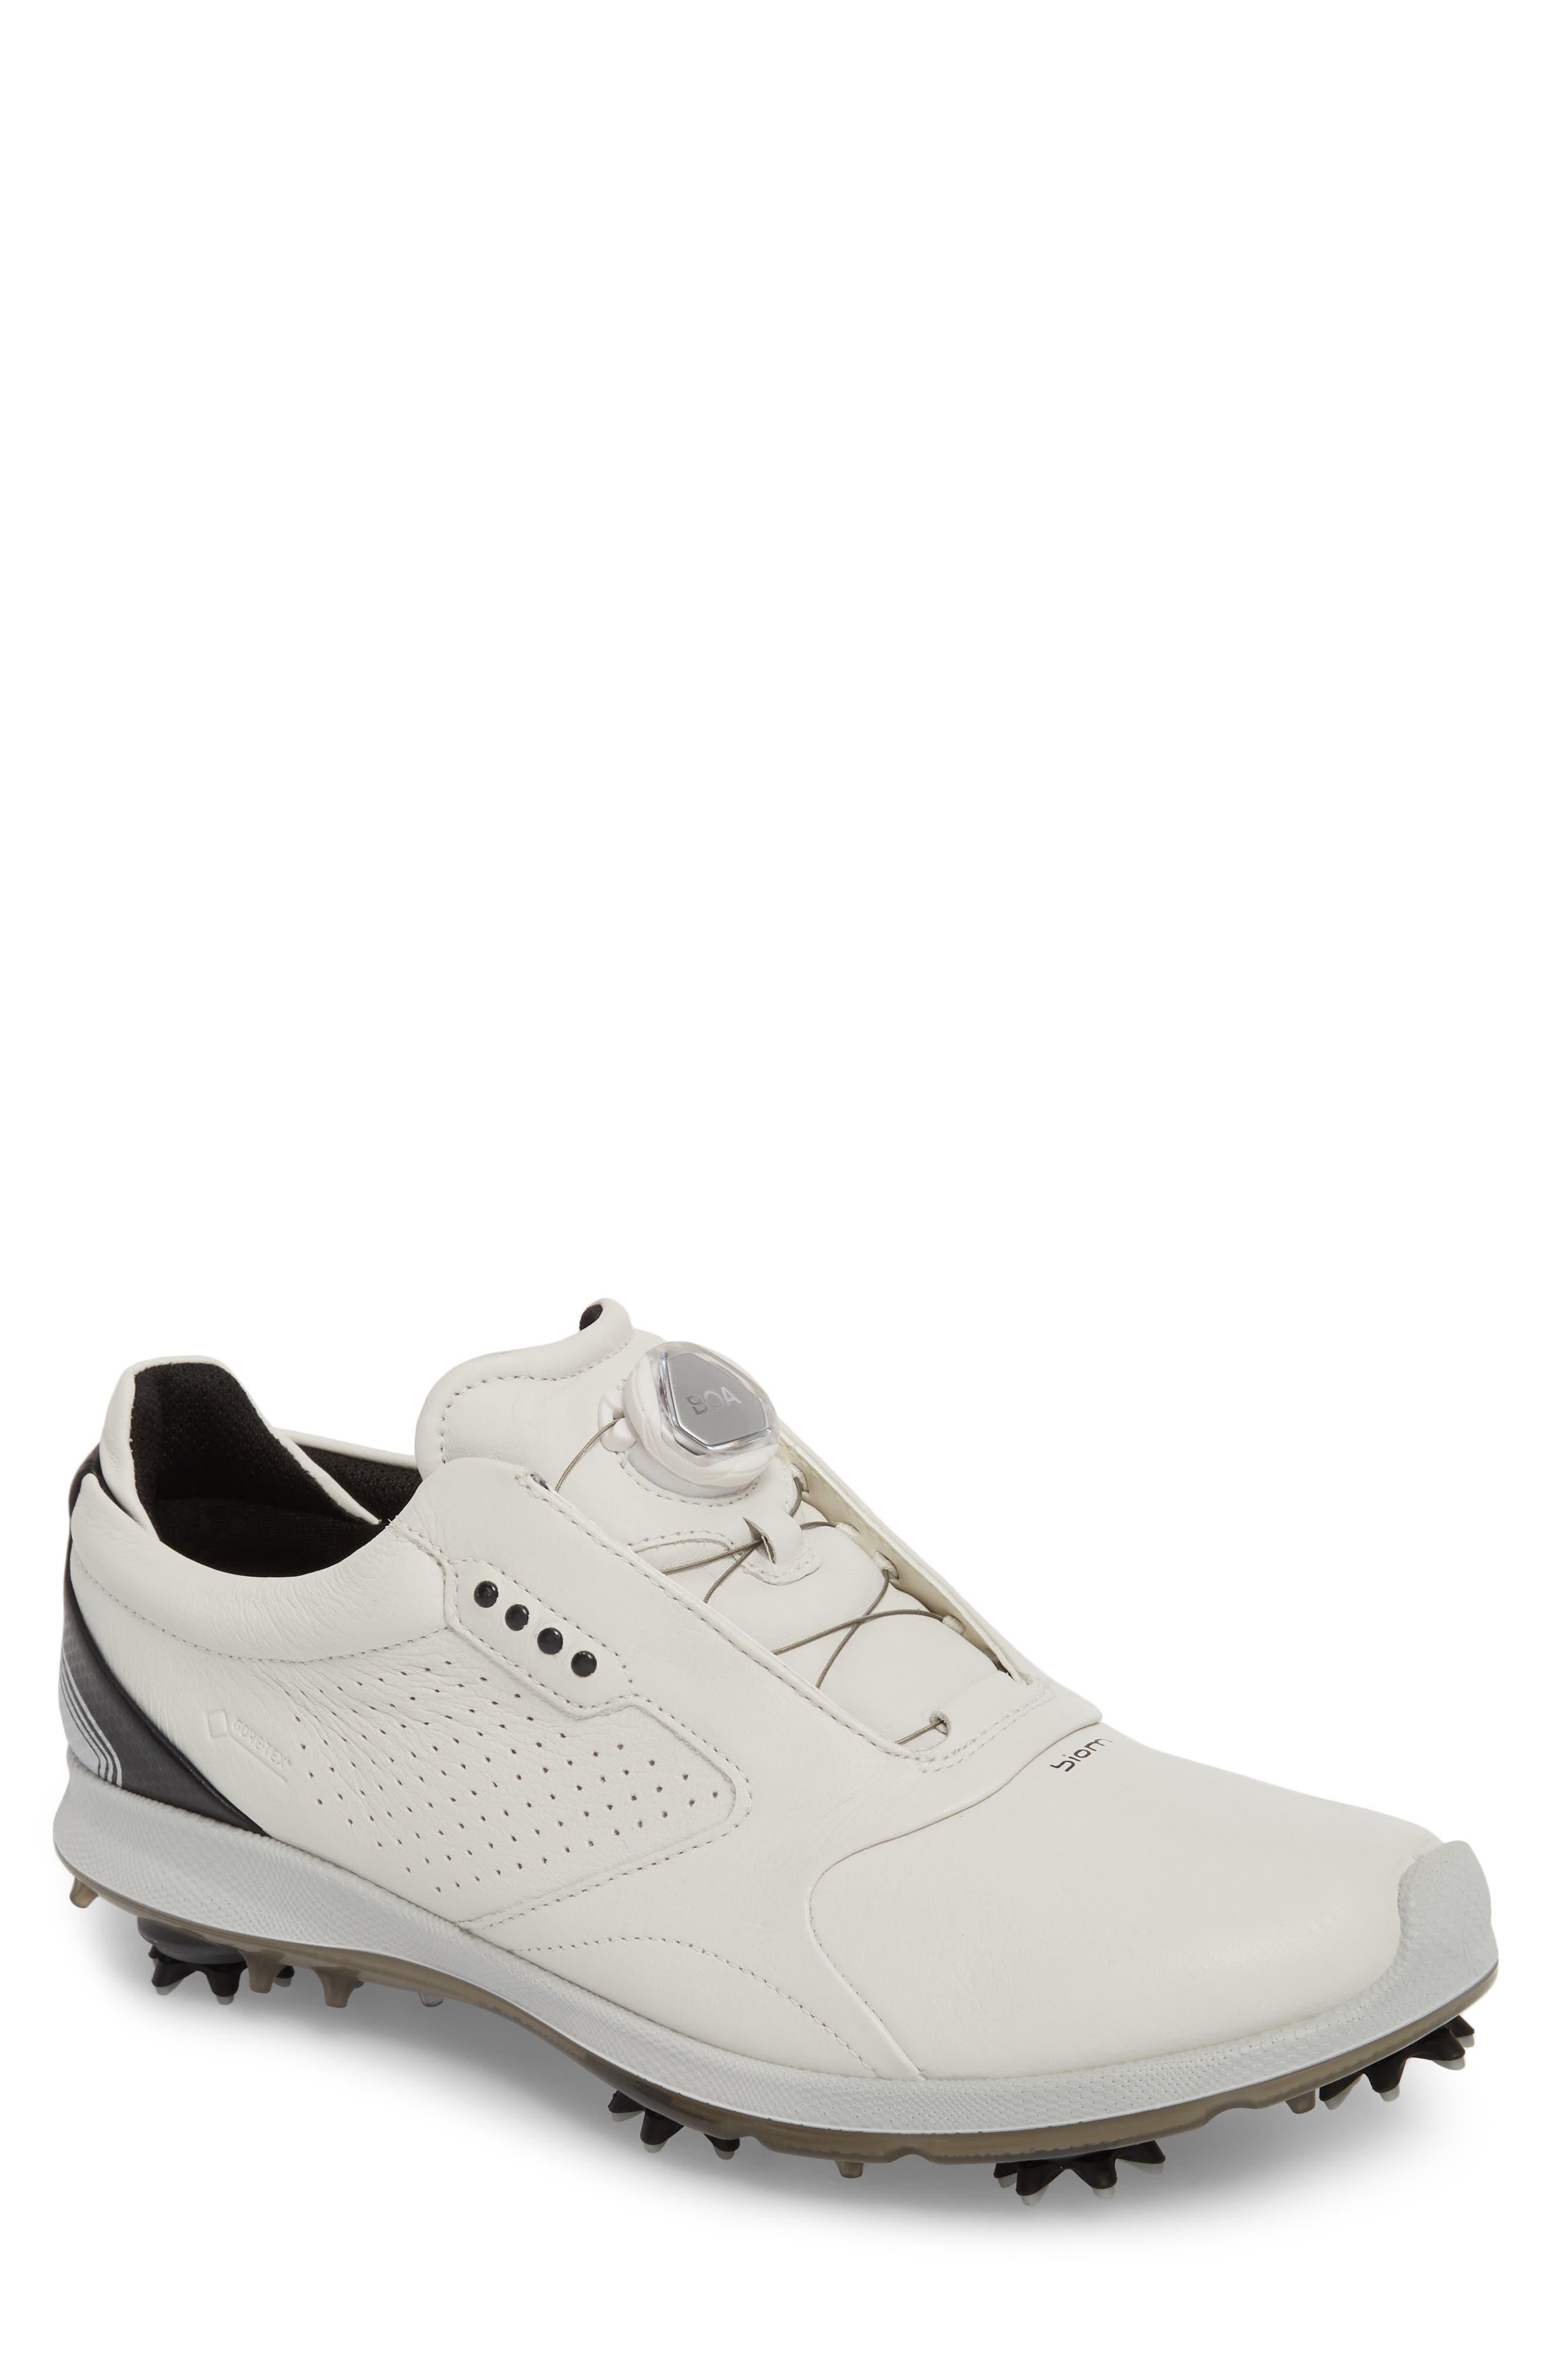 BIOM 2 BOA Gore-Tex<sup>®</sup> Golf Shoe,                             Main thumbnail 1, color,                             WHITE/ BLACK LEATHER